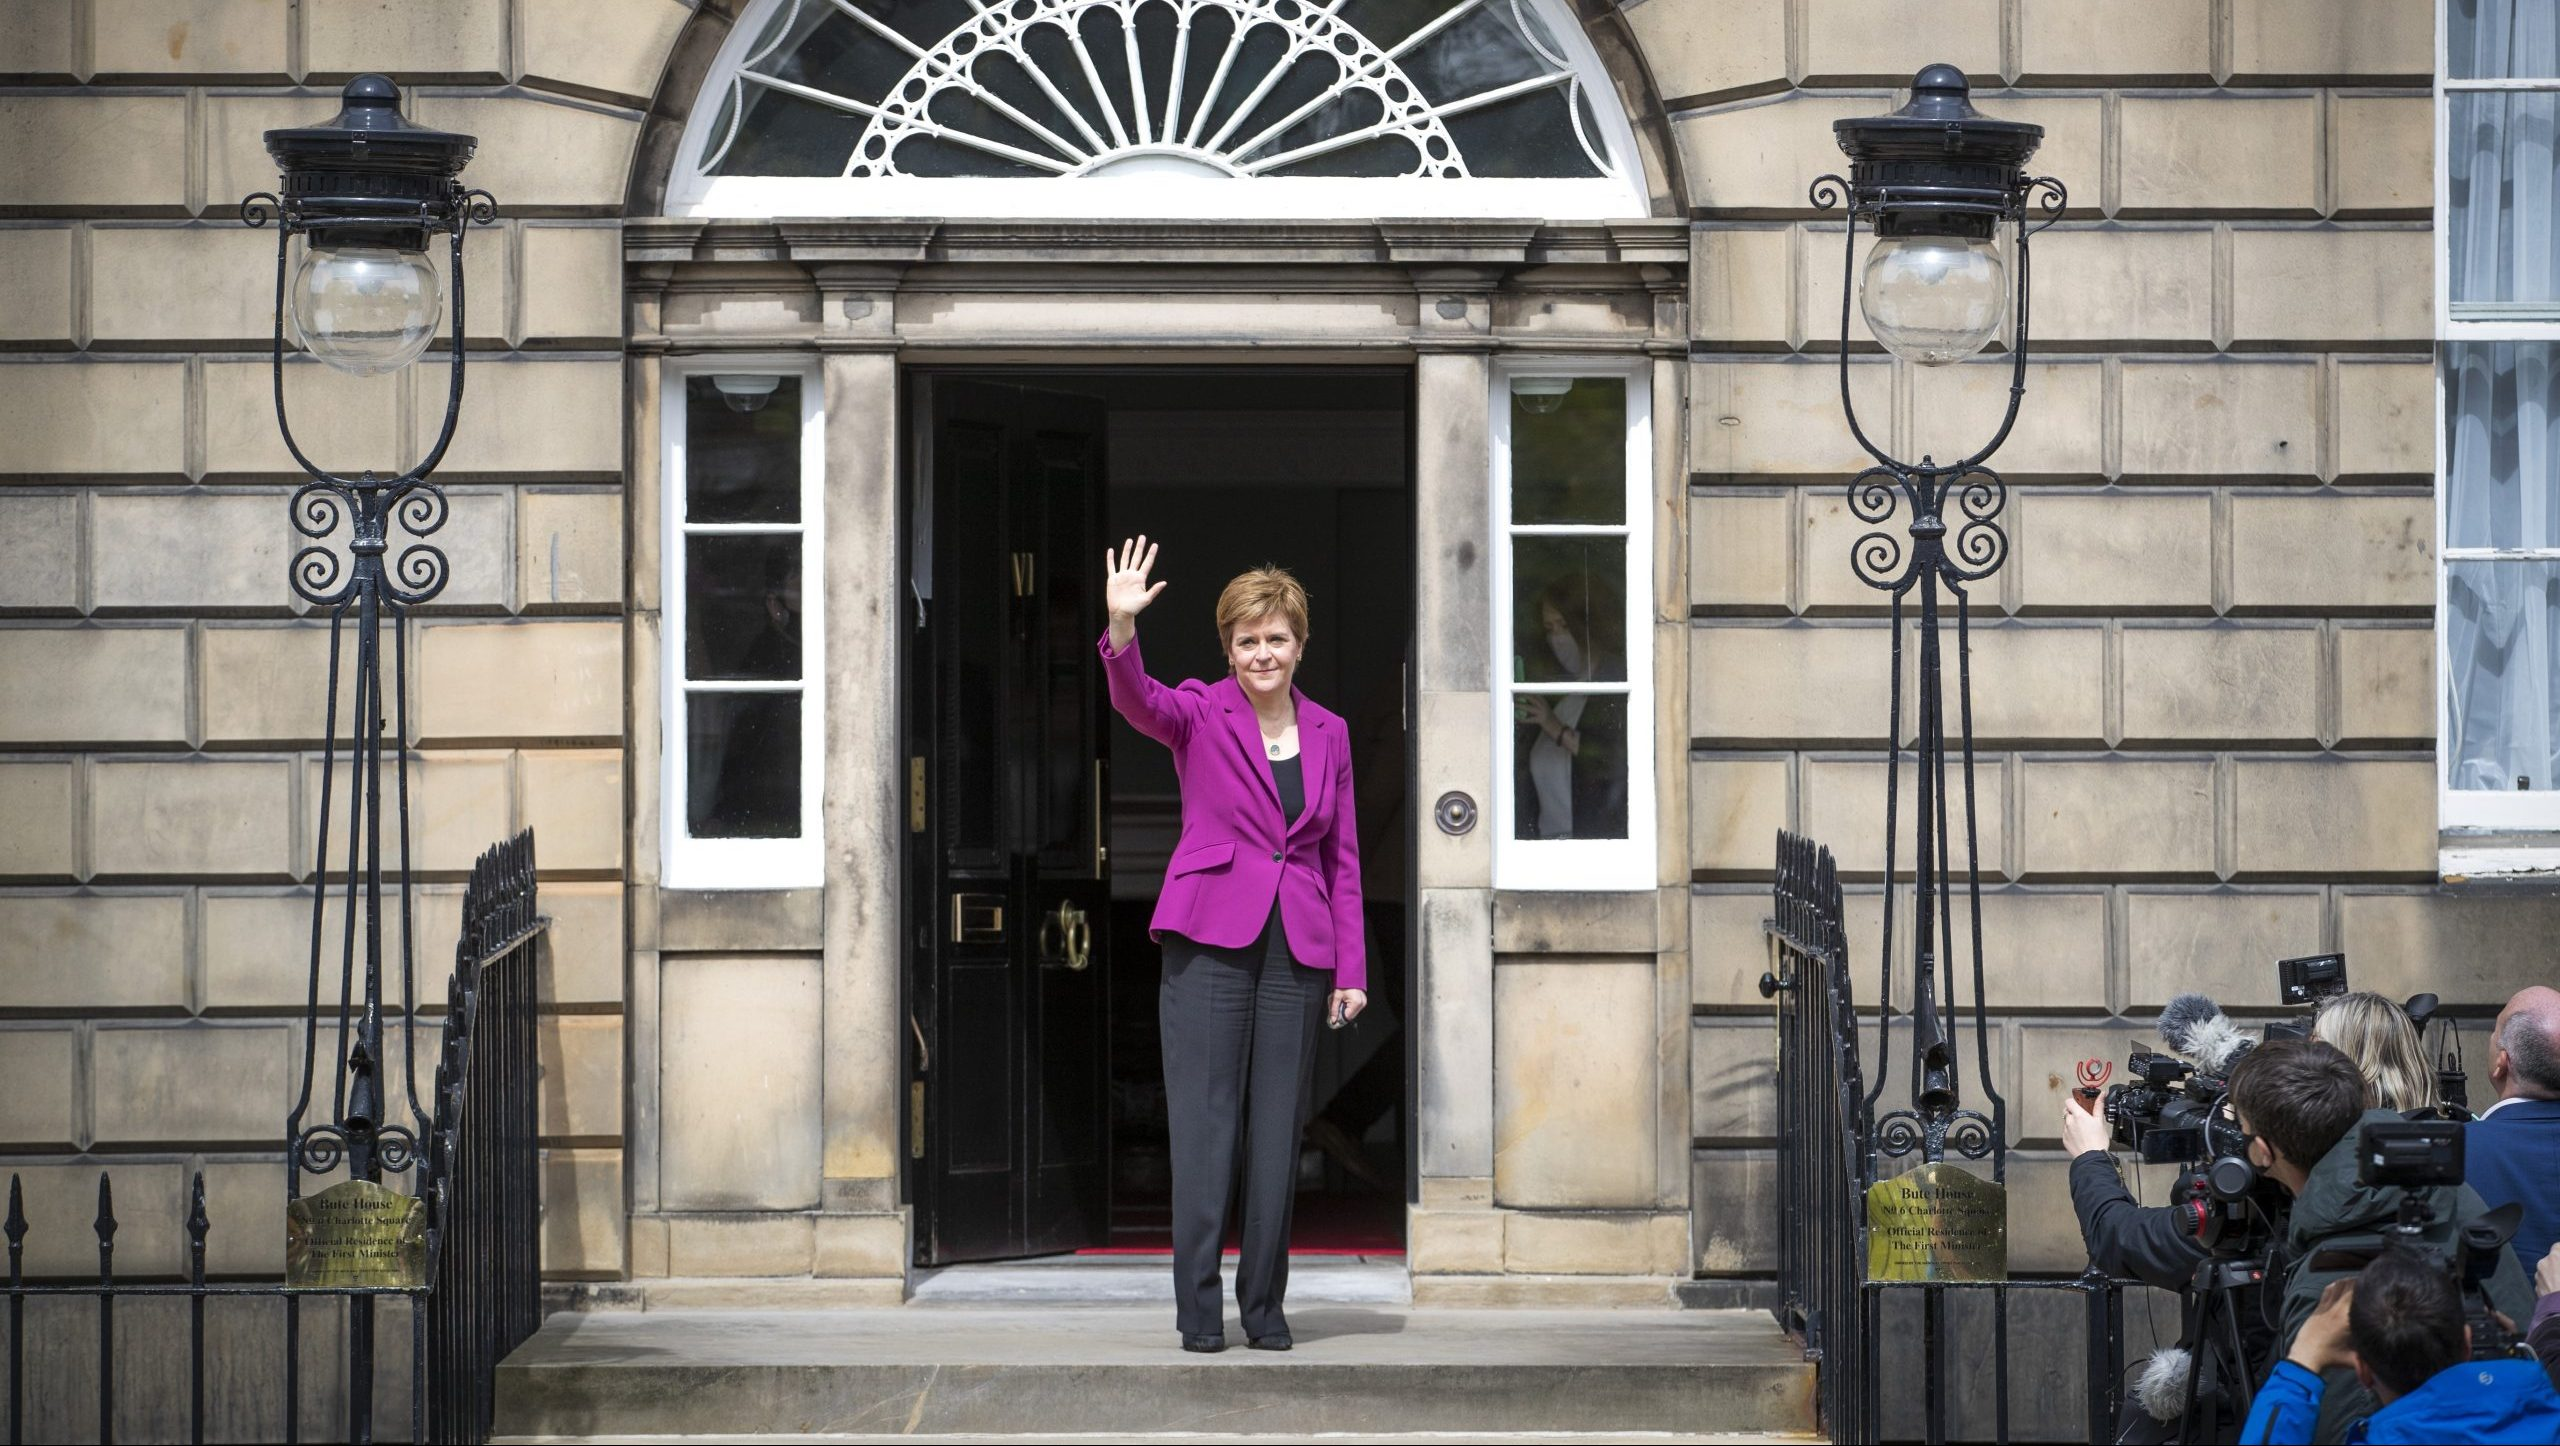 Sturgeon, a la porta de Bute House, a Edinburg, la residència oficial del primer ministre d'Escòcia, aquest diumenge / Jane Barlow/PA Wire/dpa/Europa Press